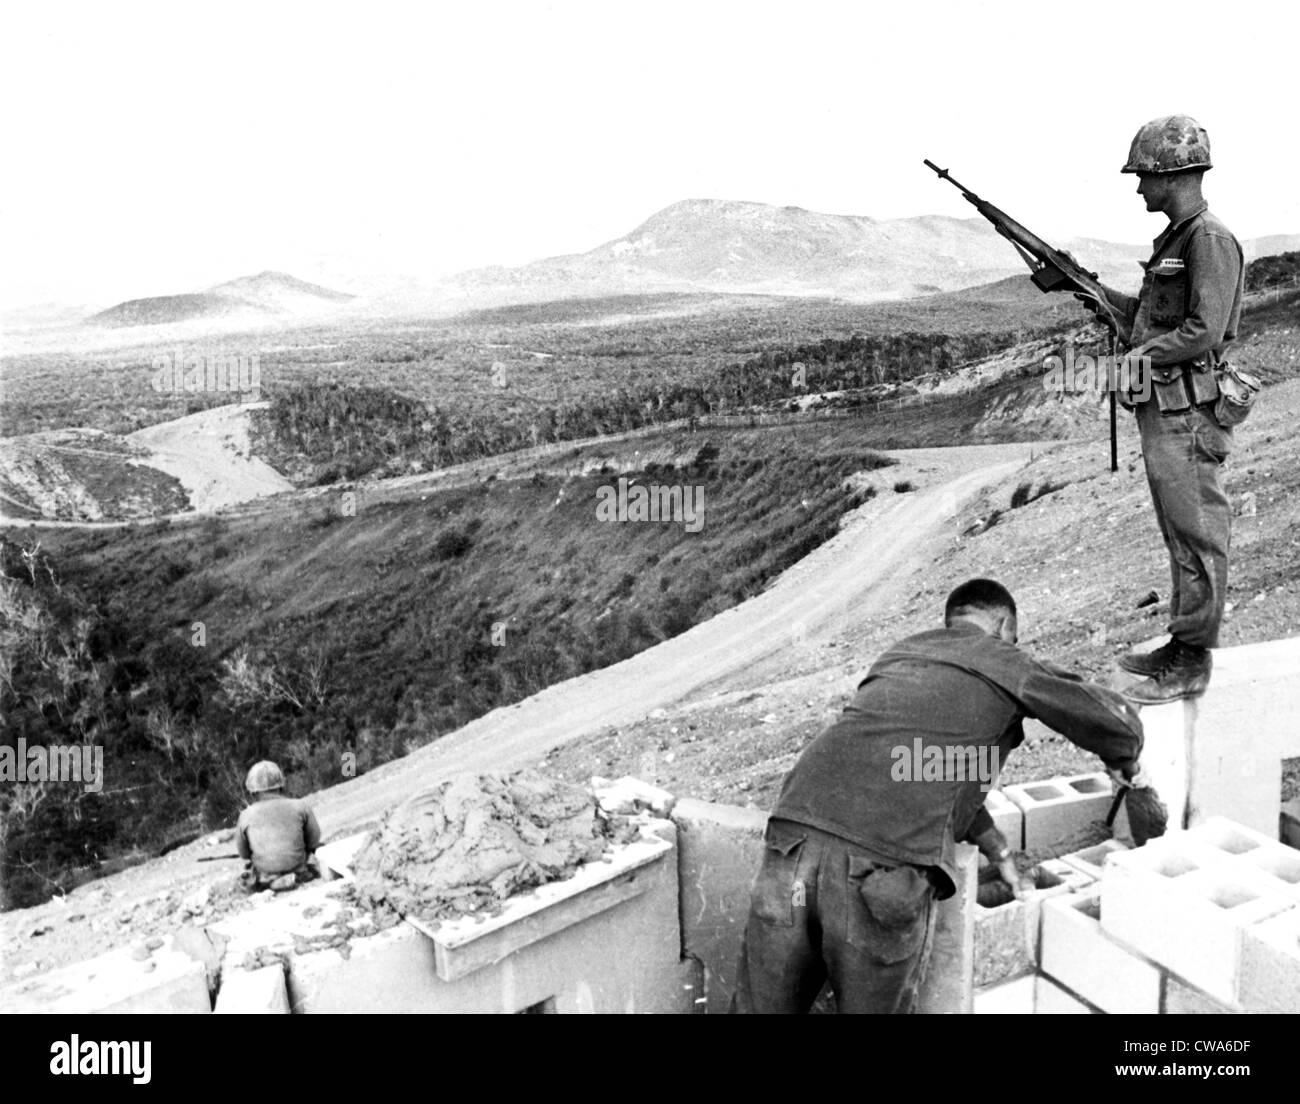 cuban missile crisis us marines fortifying suicide ridge at the guantanamo naval base